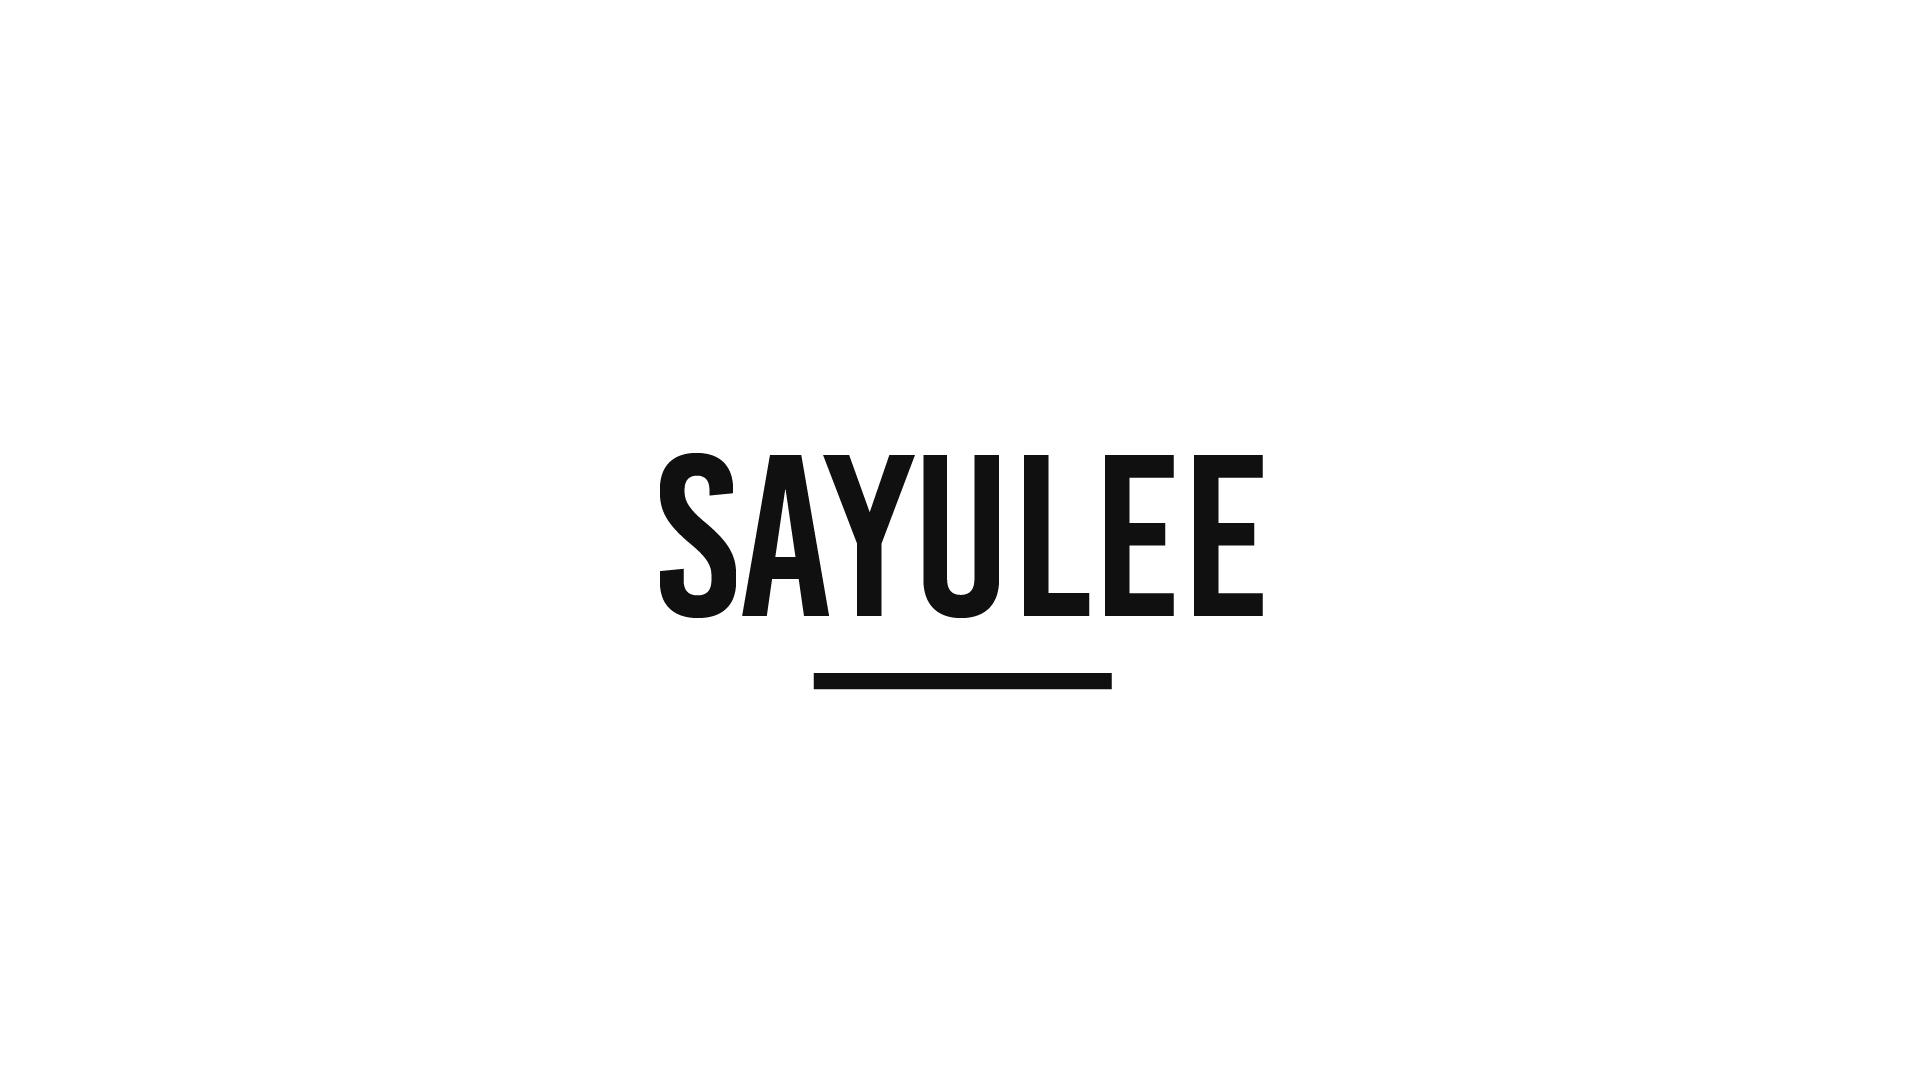 Sayulee